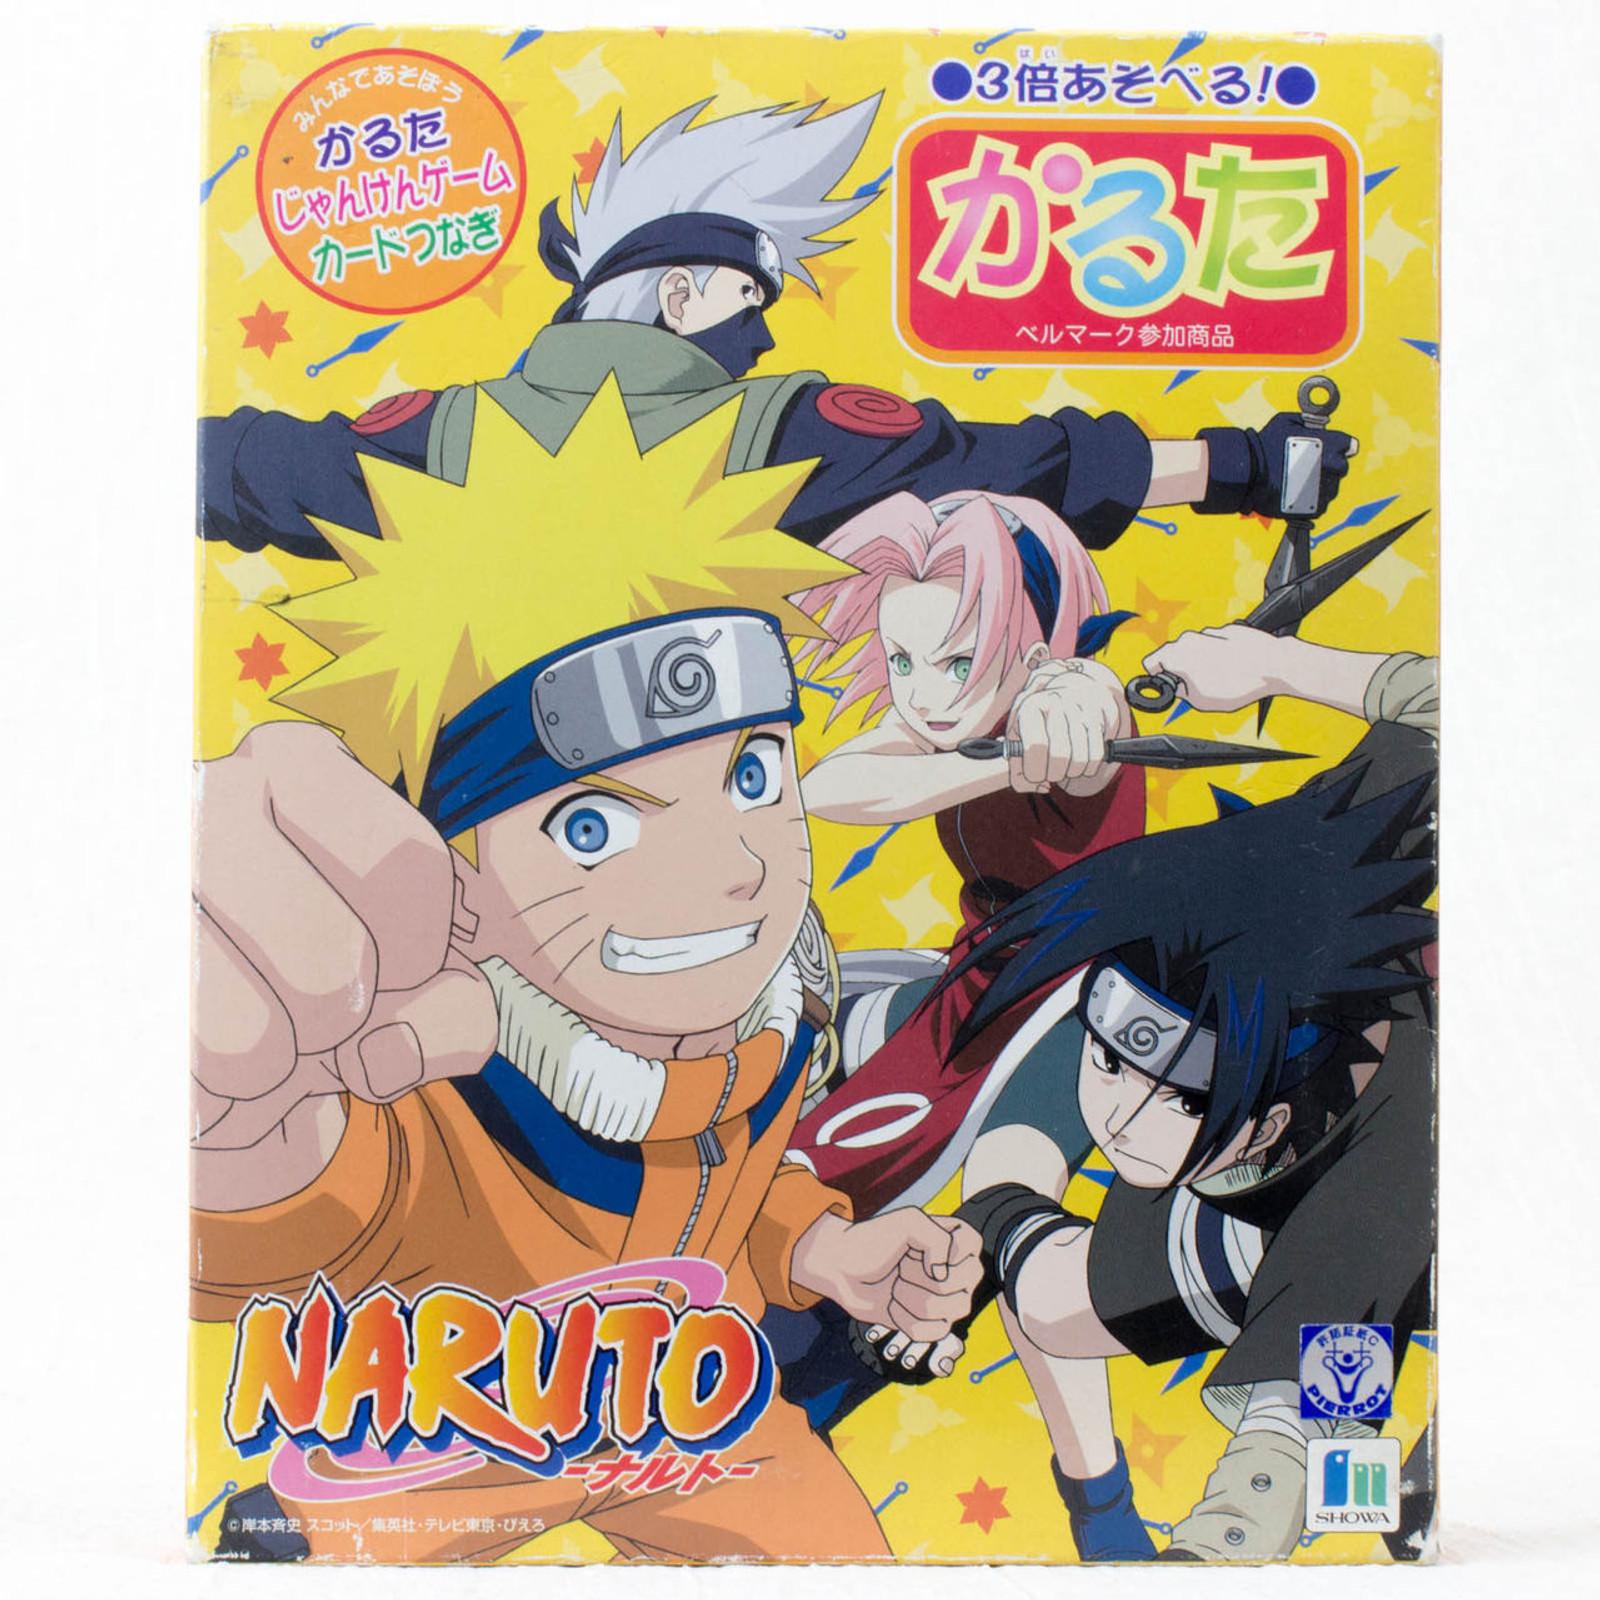 NARUTO KARUTA Japanese Card Game JAPAN ANIME MANGA